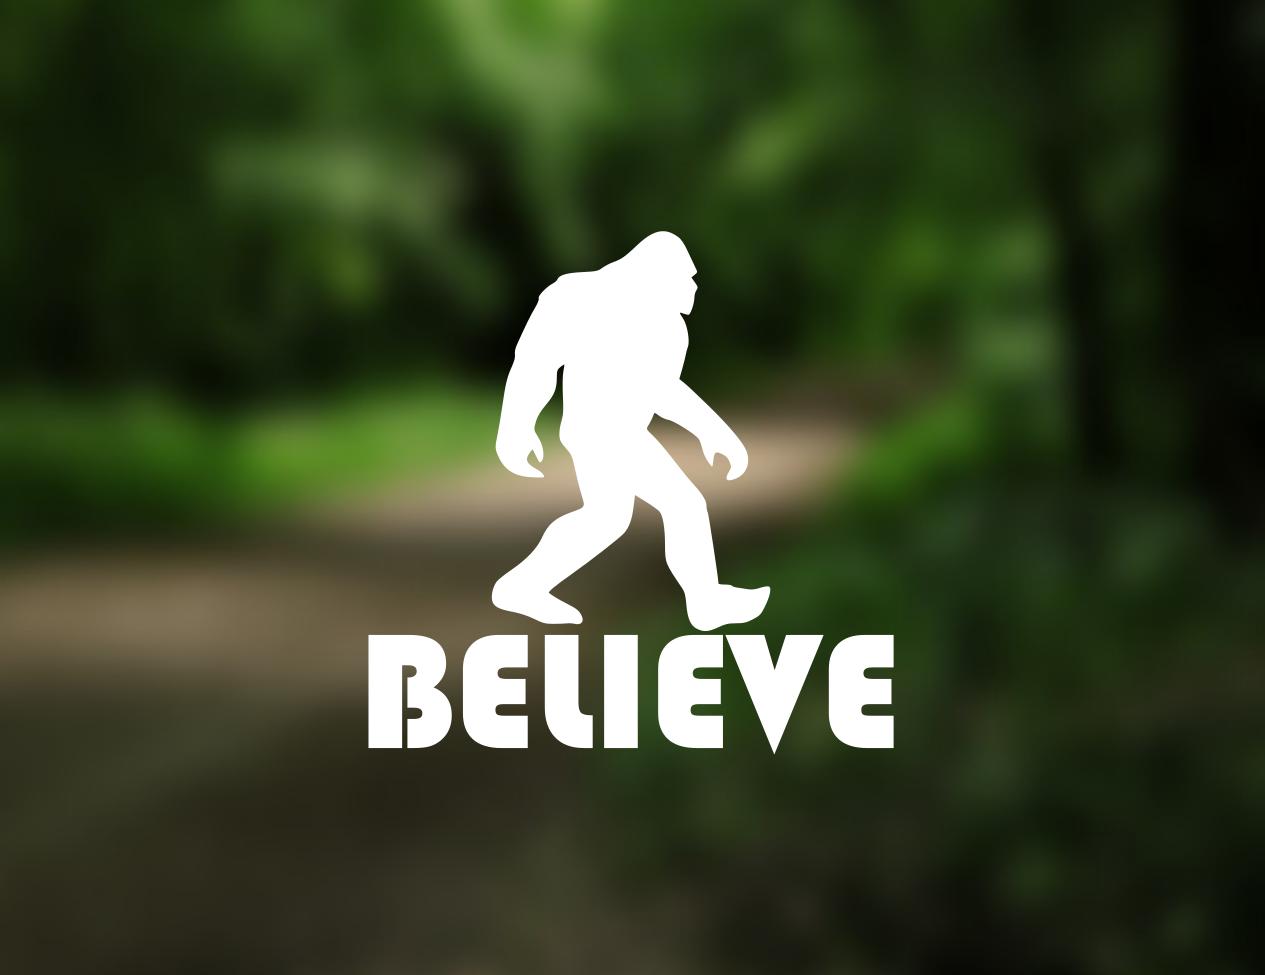 BELIEVE Bigfoot Sasquatch Vinyl Decal Sticker Car window laptop